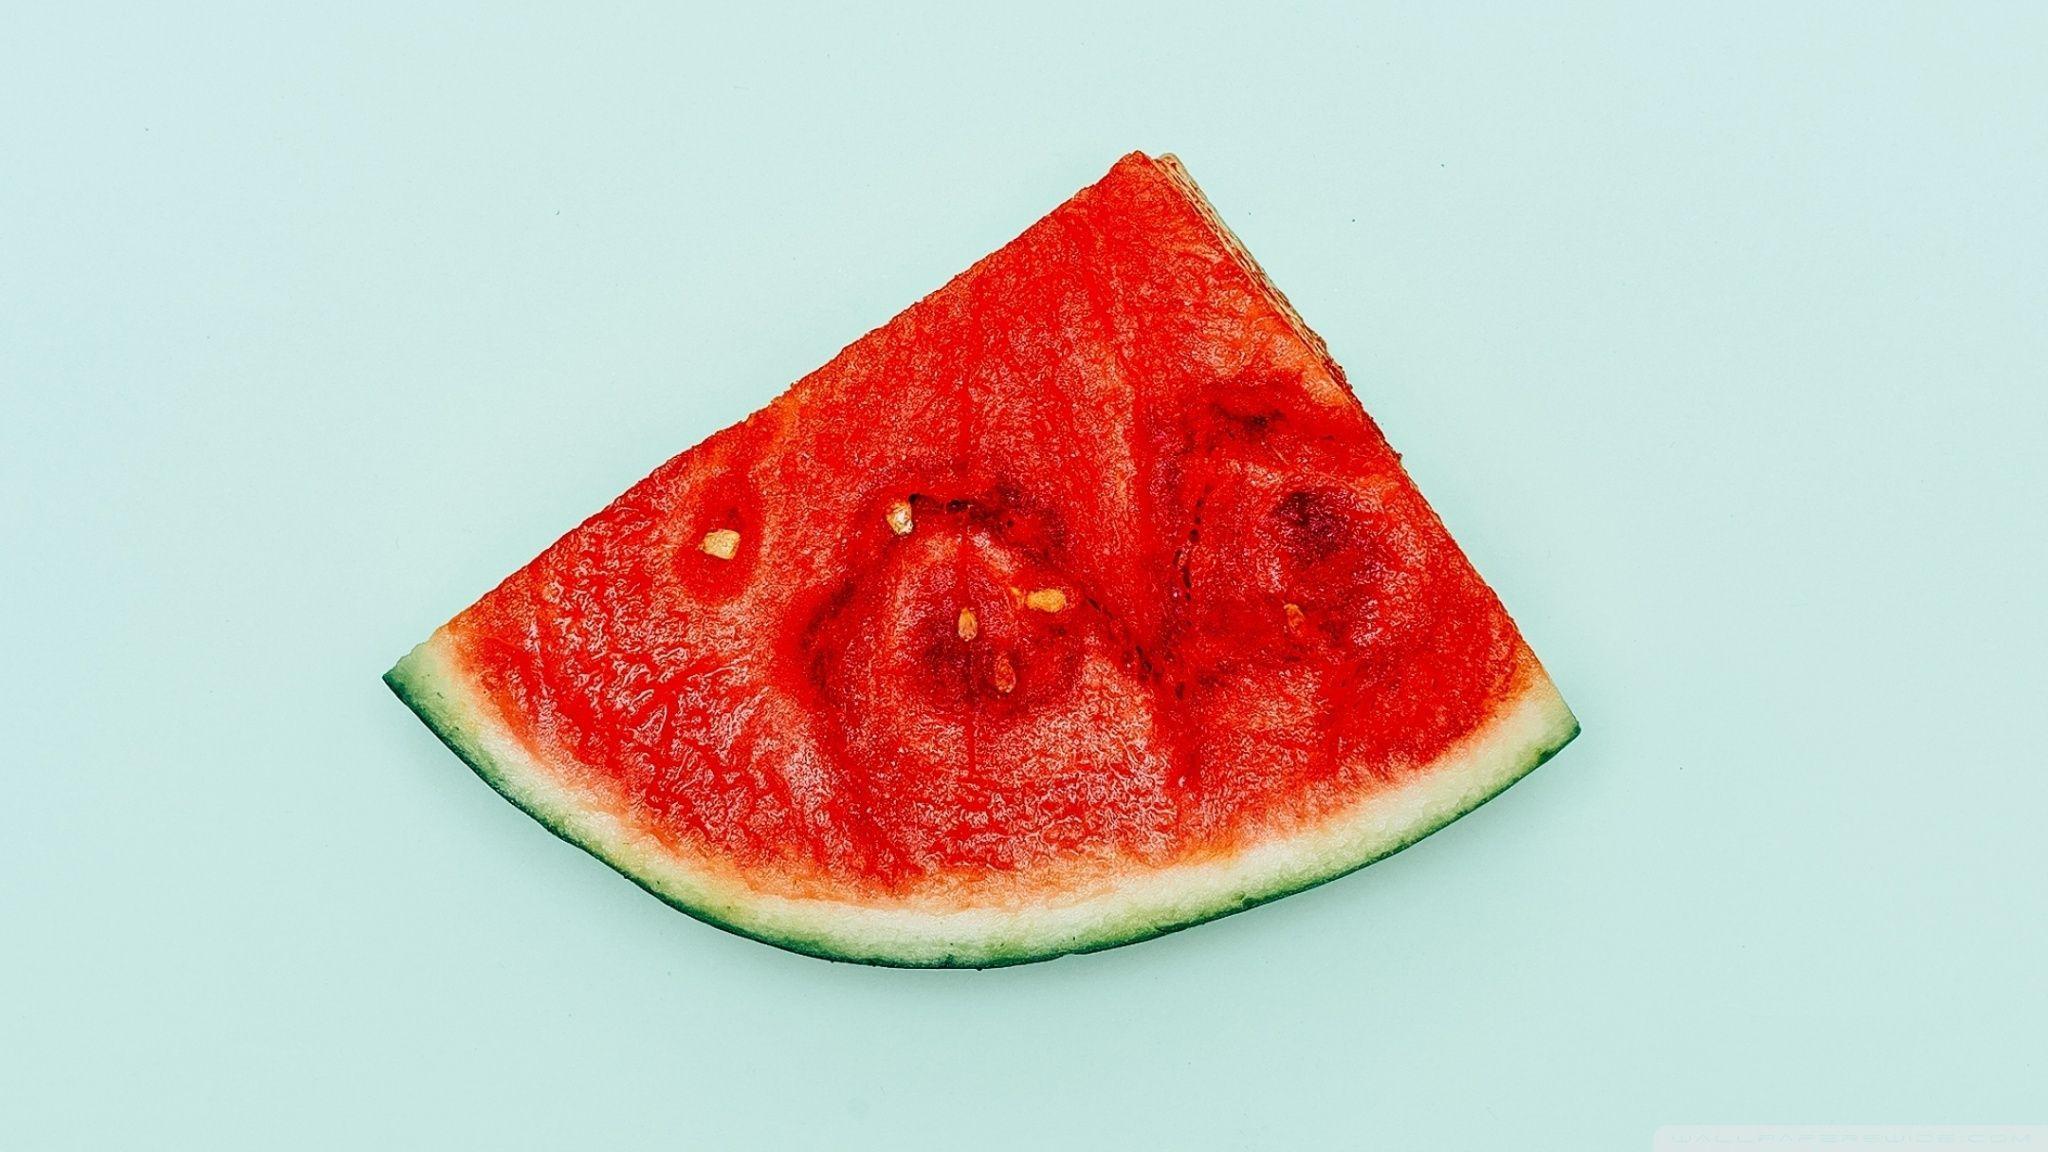 watermelon cartoon image